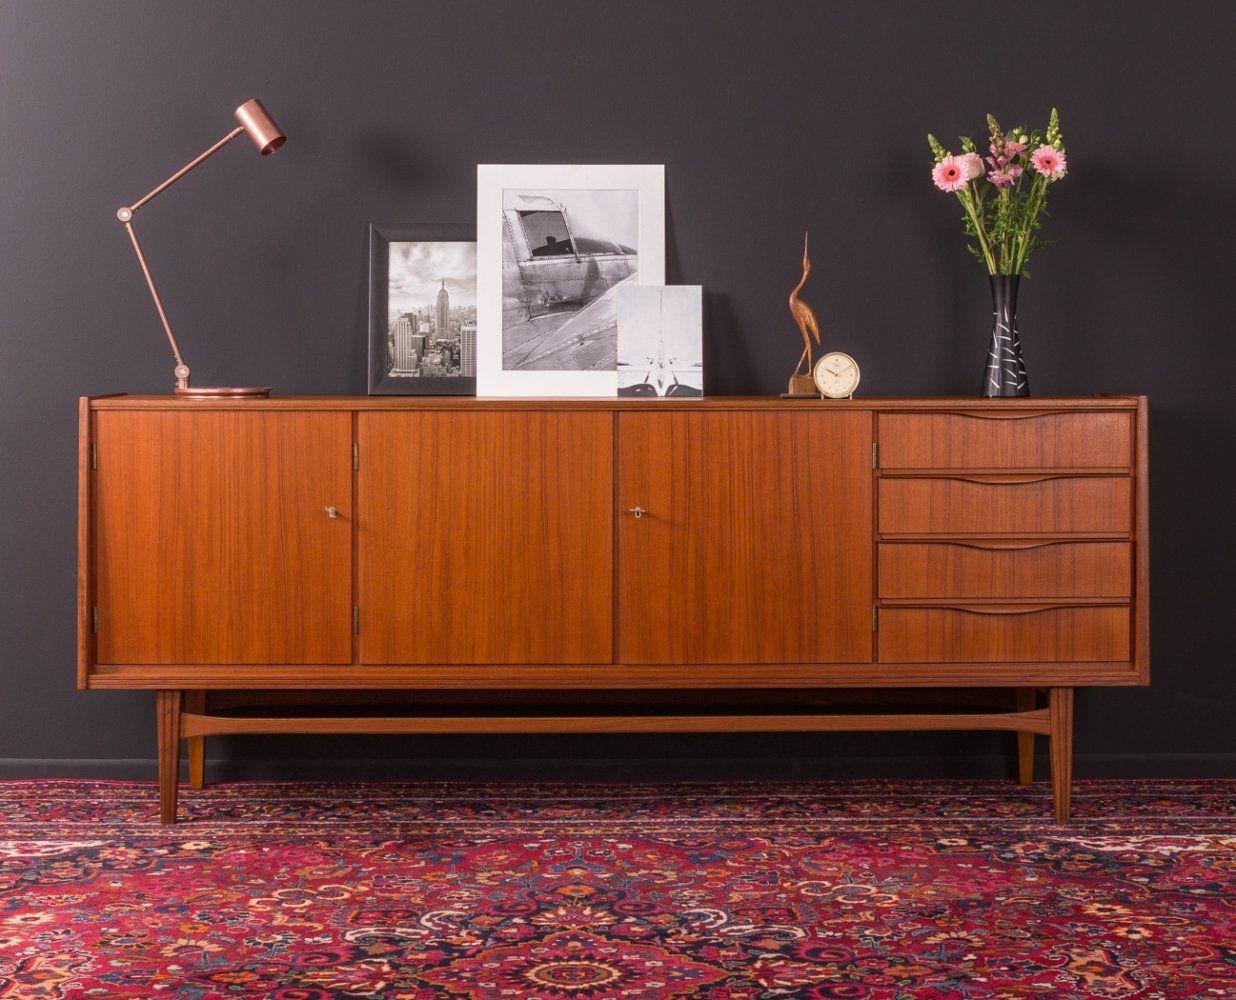 For Sale Scandinavian Design Teak Sideboard Germany 1950s Teak Sideboard Scandinavian Design Sideboard Scandinavian Design